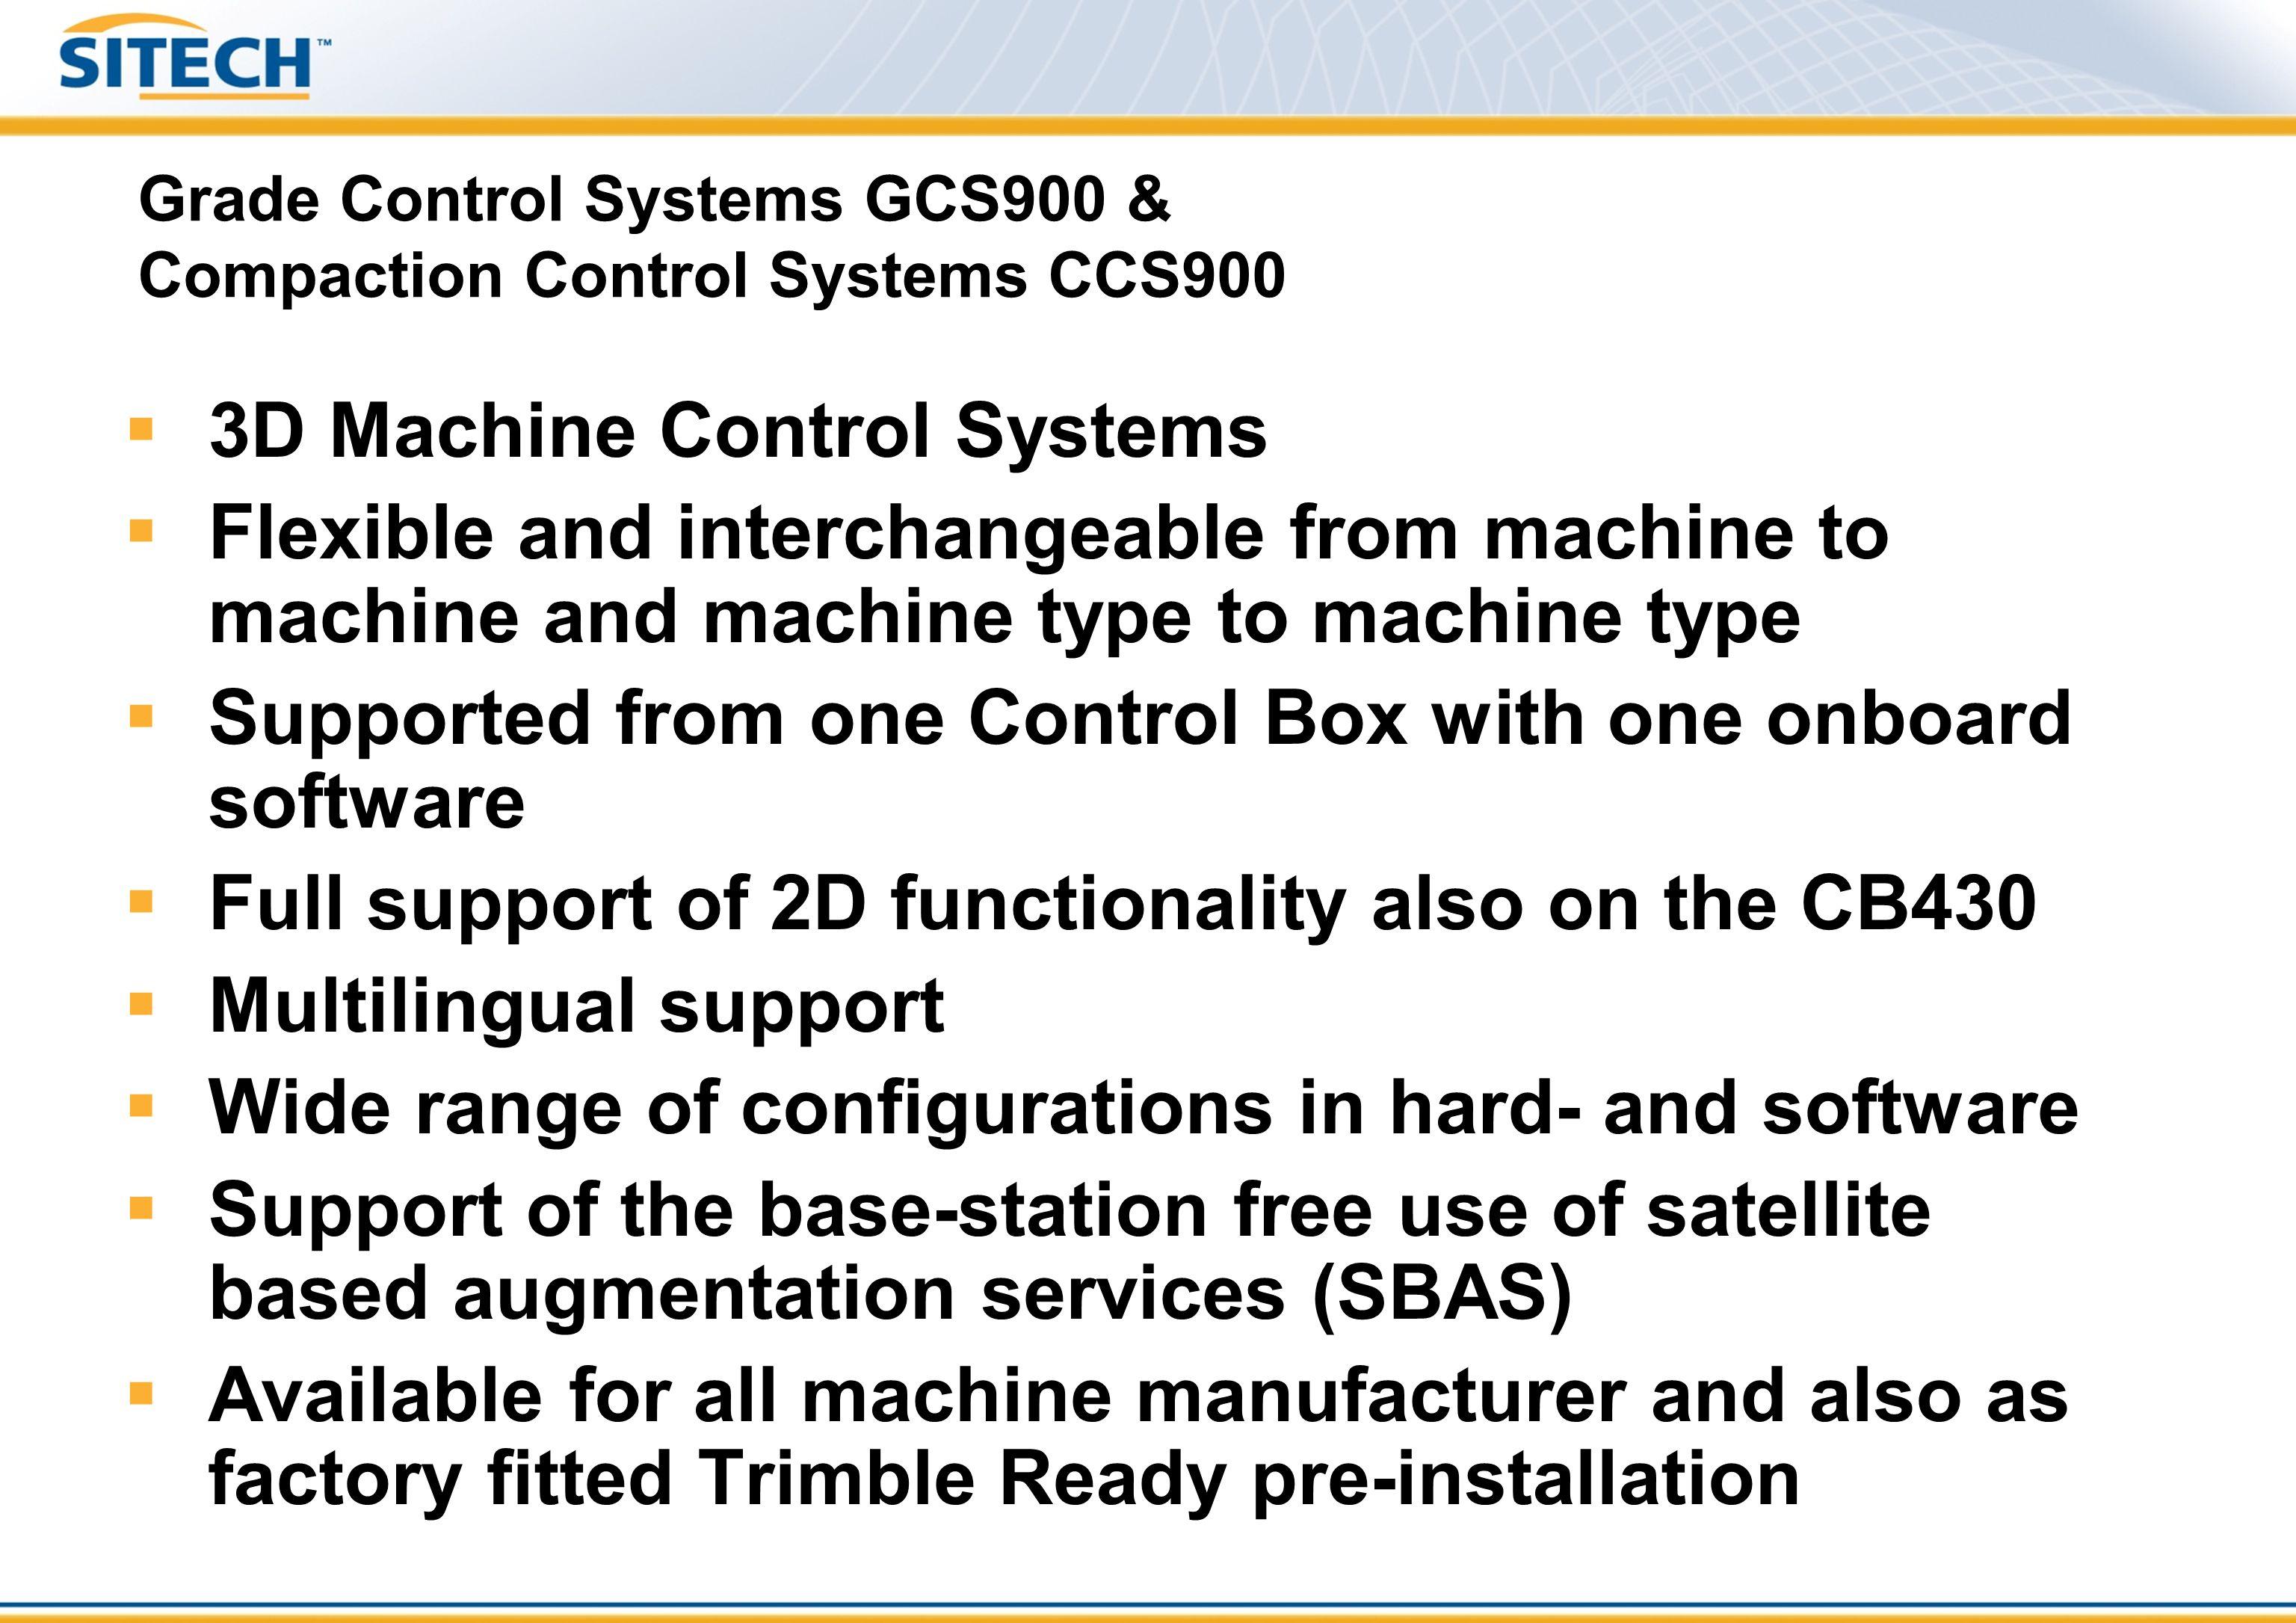 Trimble GCS900: 3D Excavator - Single GNSS SNRMS9X0CB430 LB400 Boom AS450 Bucket AS450 Stick AS450 Tilt-bucket AS450 (optional) Platform AS21-2 Rototilt AS455 (optional) Harness SNM930 or